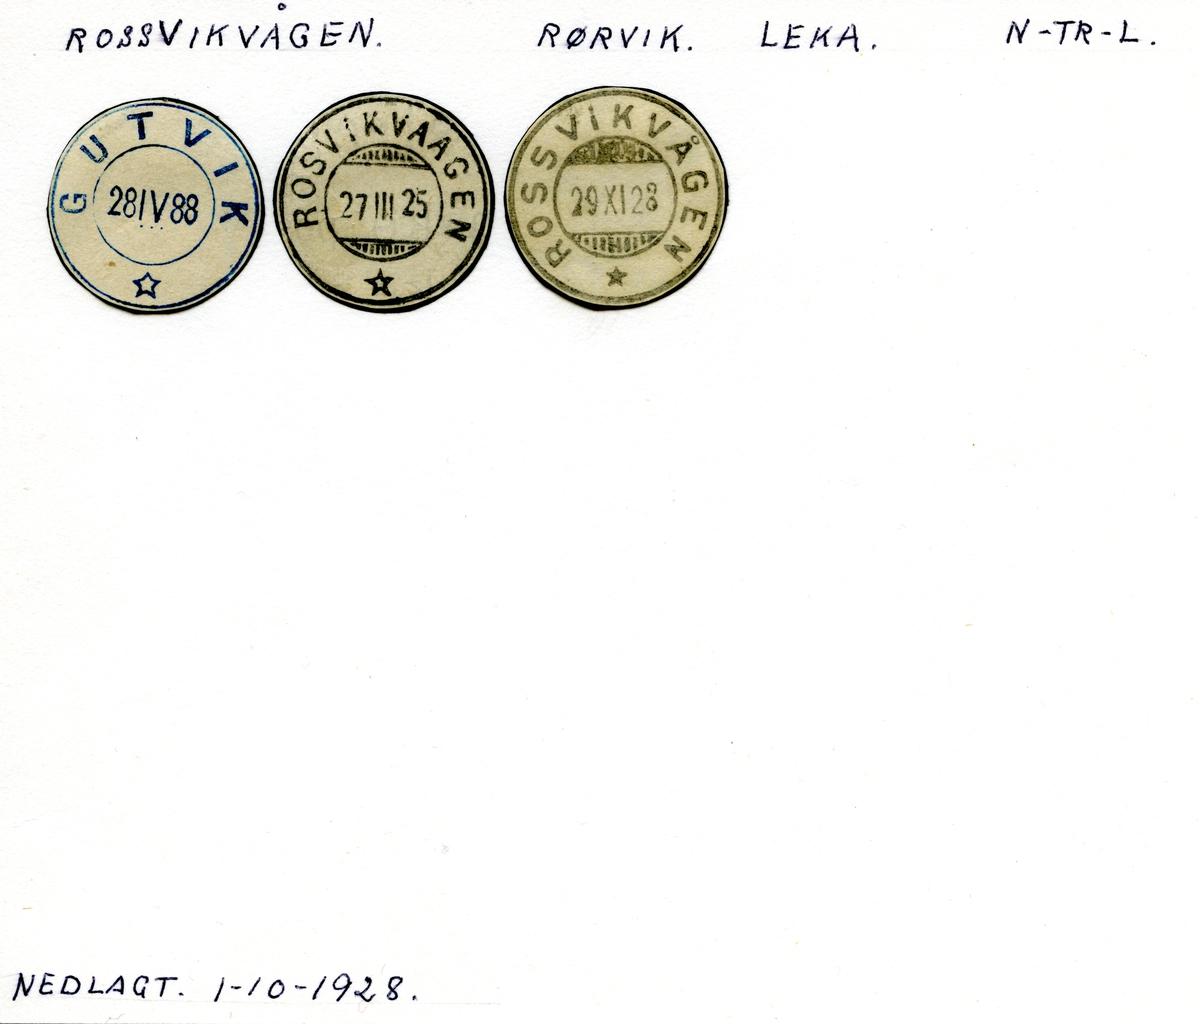 Stempelkatalog Rossvikvågen (Gutvik, Rosvikvaagen), Leka, Nord-Trøndelag